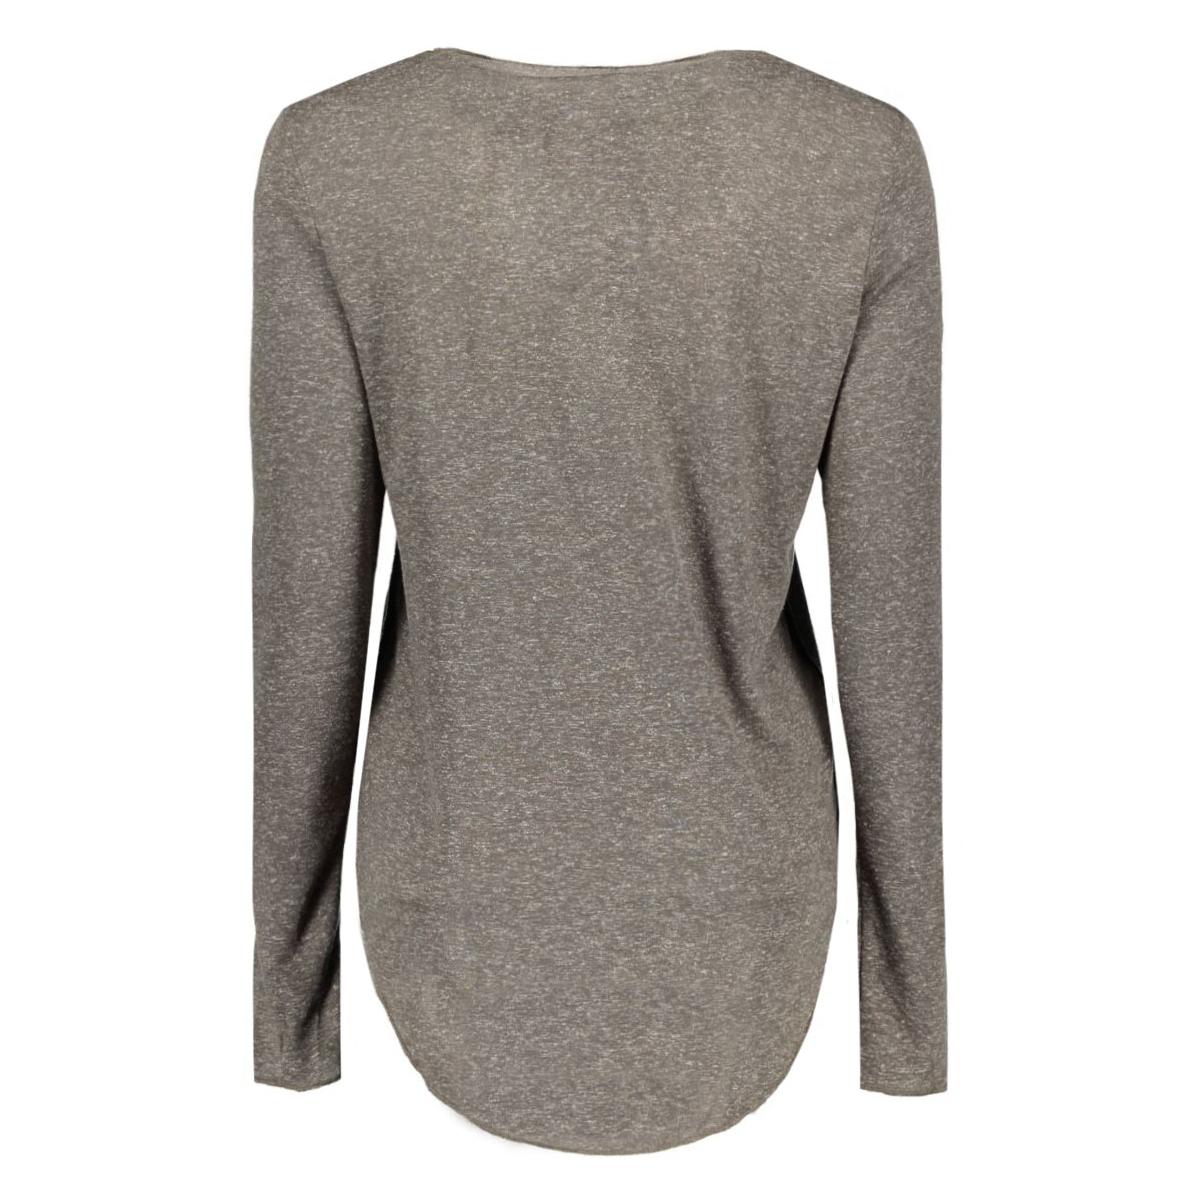 vmlua ls top noos 10158658 vero moda t-shirt beluga